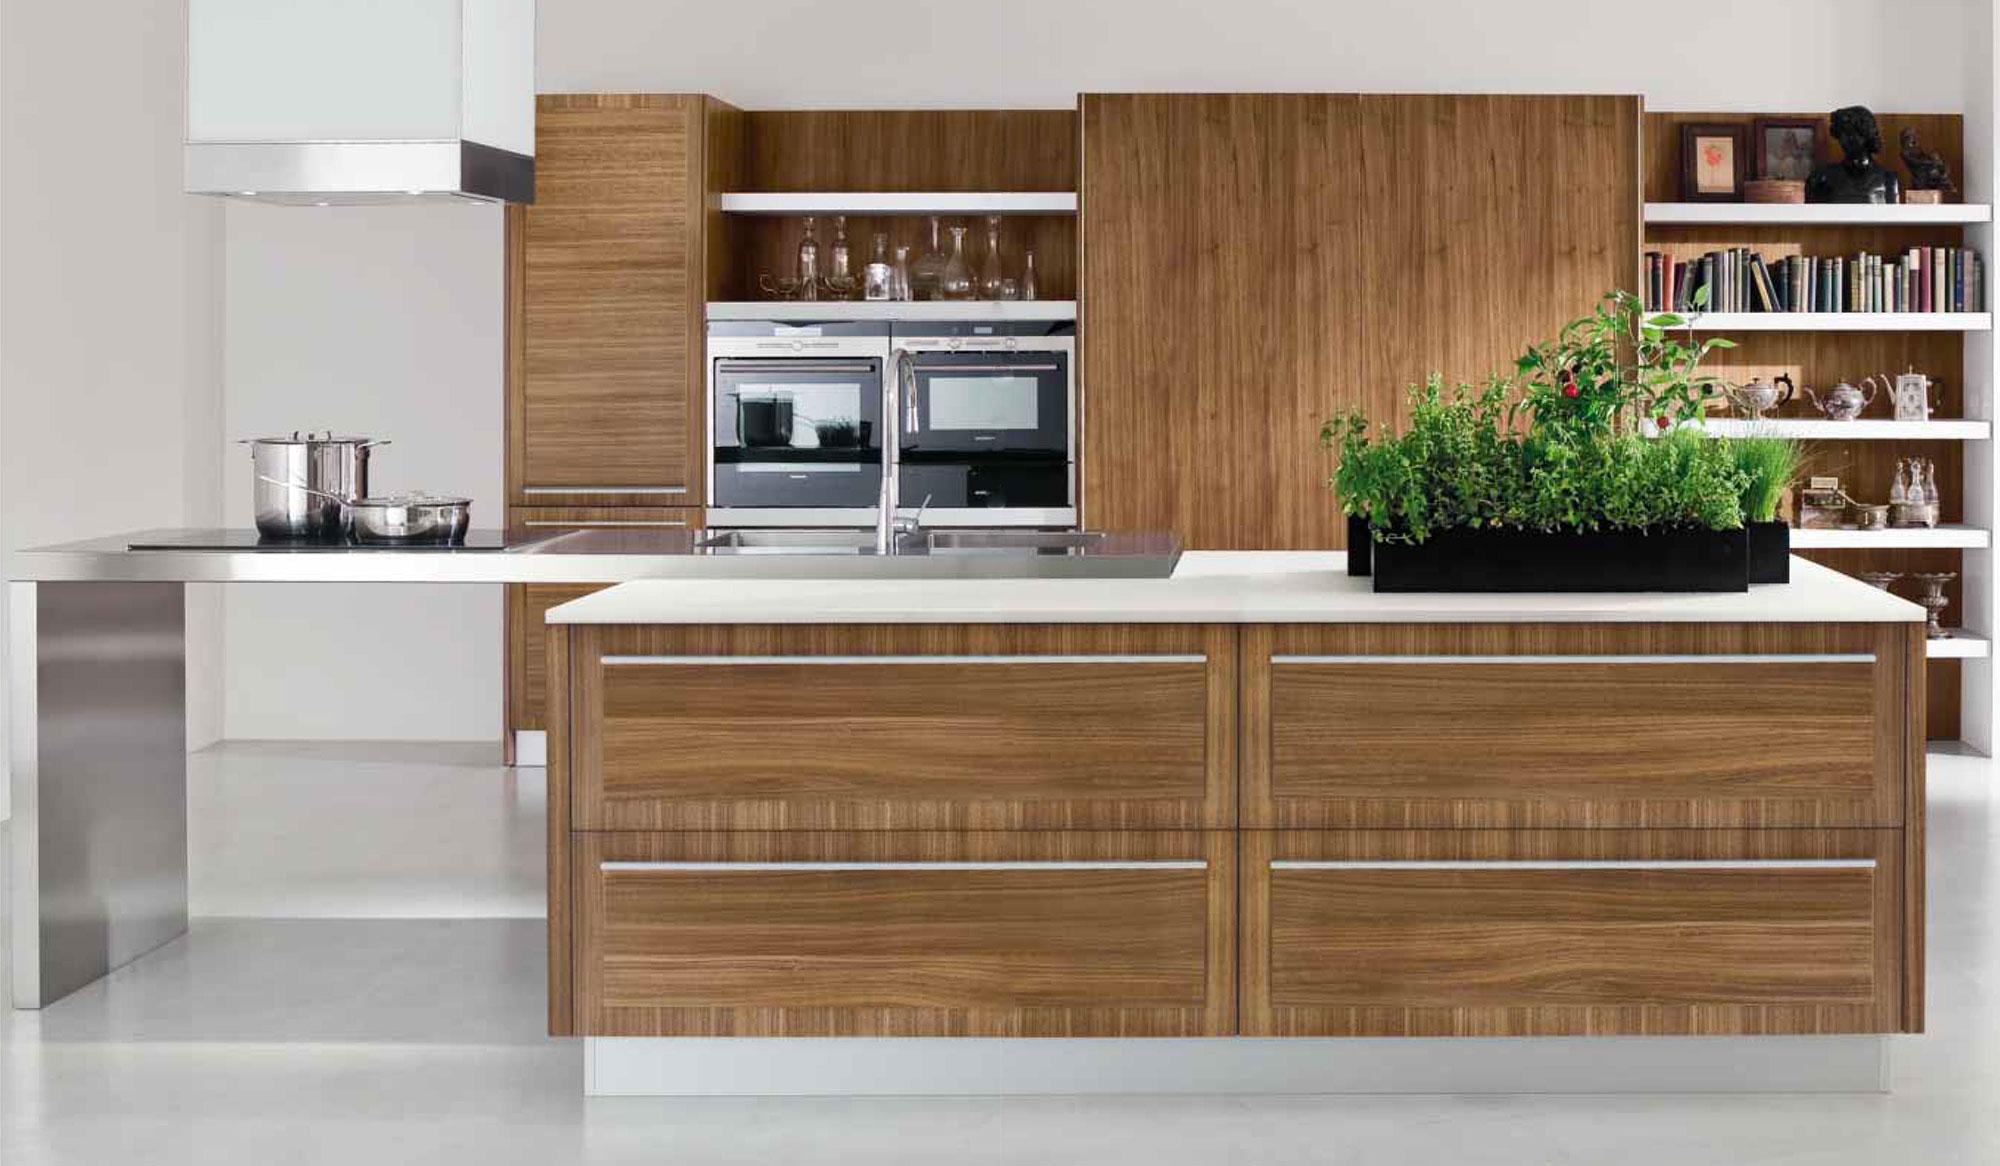 cucine moderne su pavimento grigio | madgeweb.com idee di interior ... - Cucine Moderne A Legna